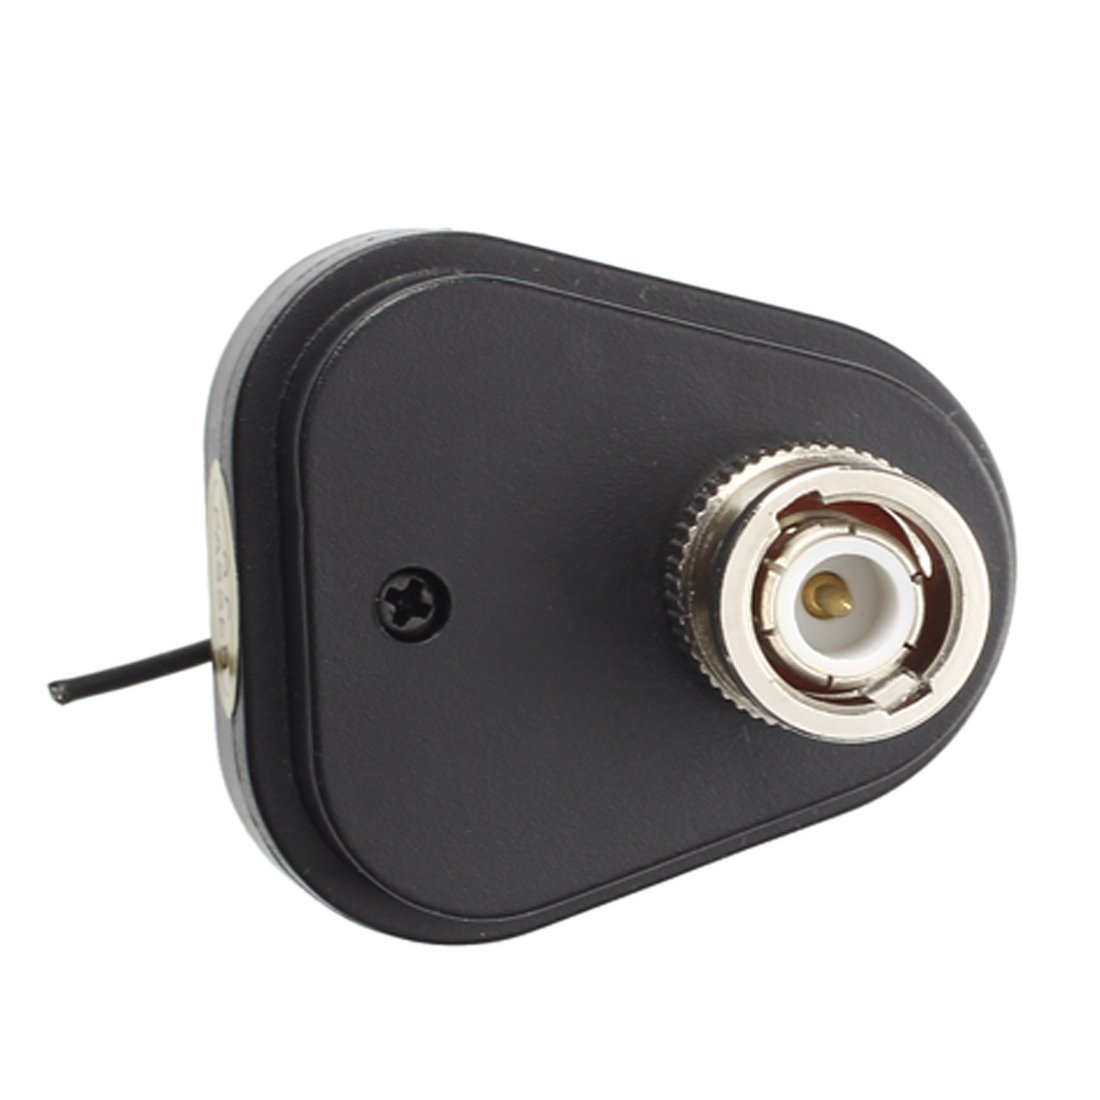 SODIAL(R) 2.4GHz Wired to Wireless CCTV Camera 4CH BNC Converter